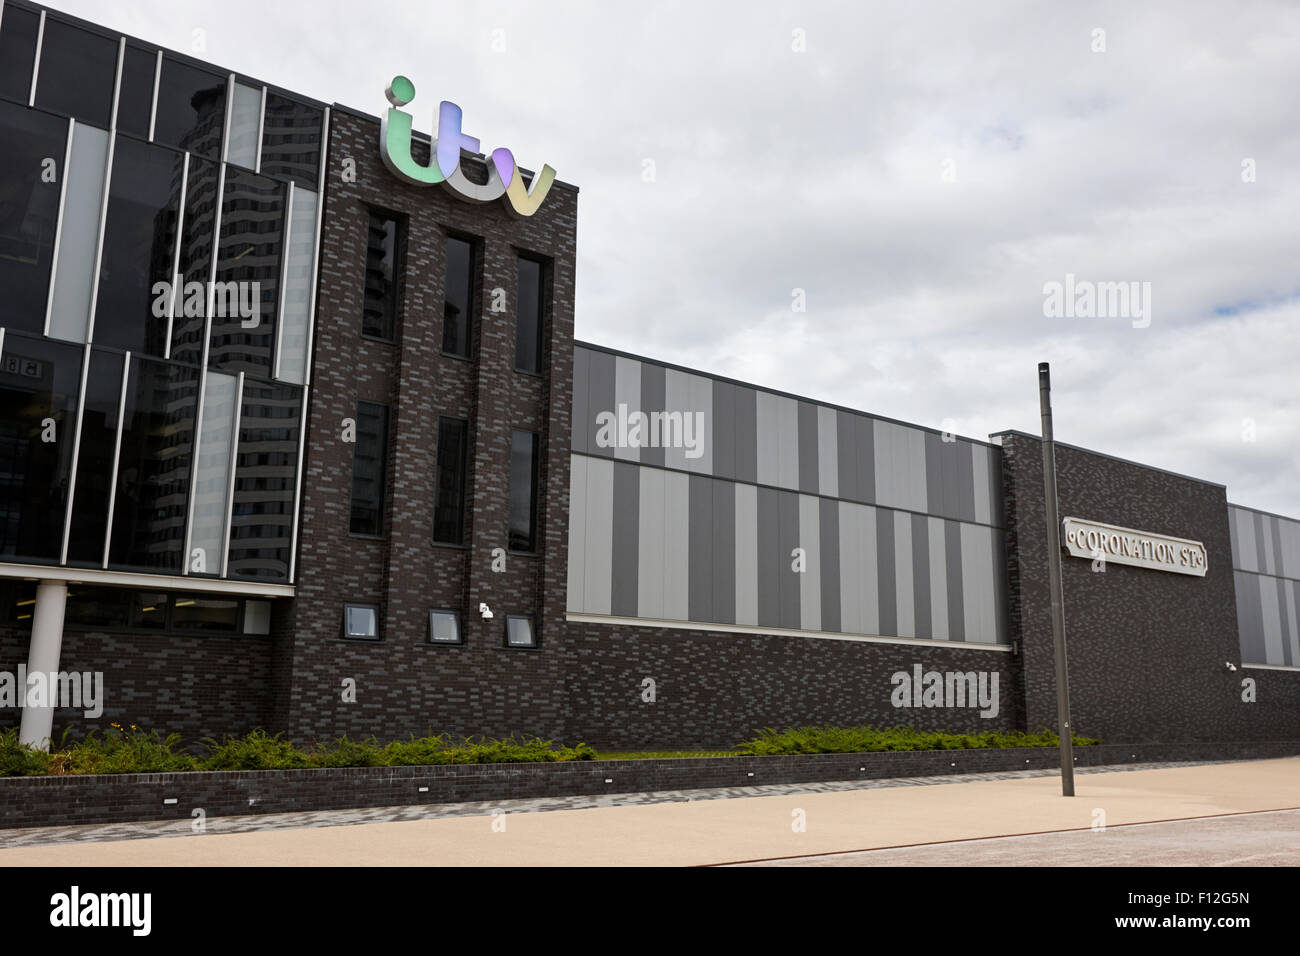 ITV coronation street studios salford mediacity Manchester uk - Stock Image